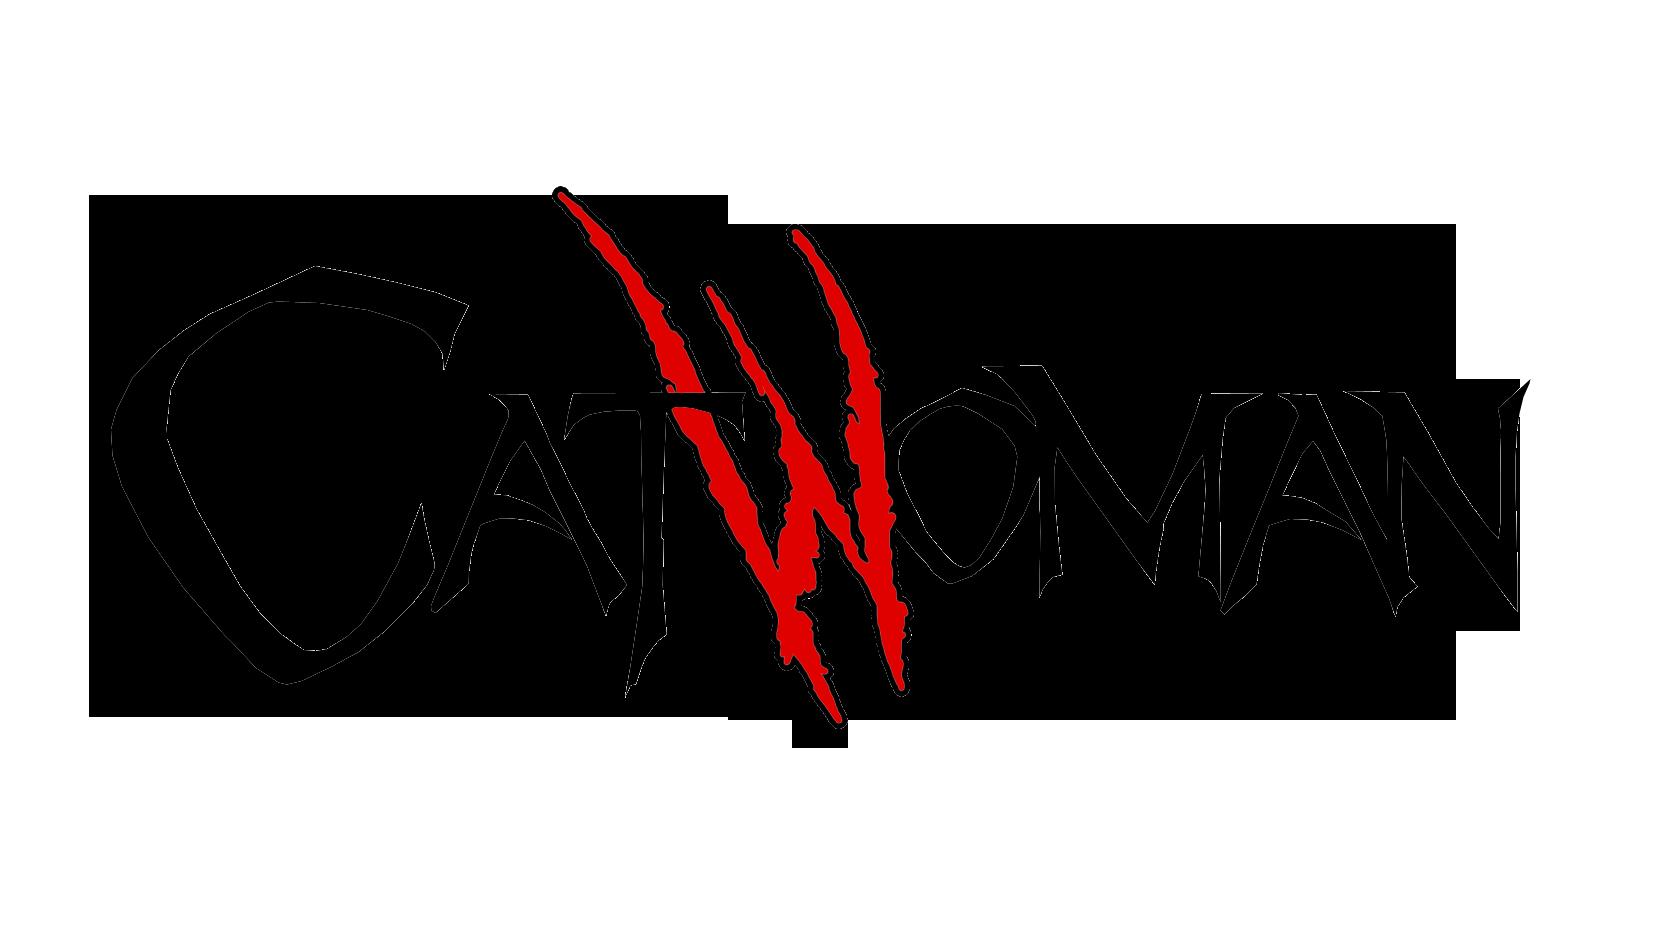 catwoman vol 4 dc comics database marvel logo font alternative marvel logo font name